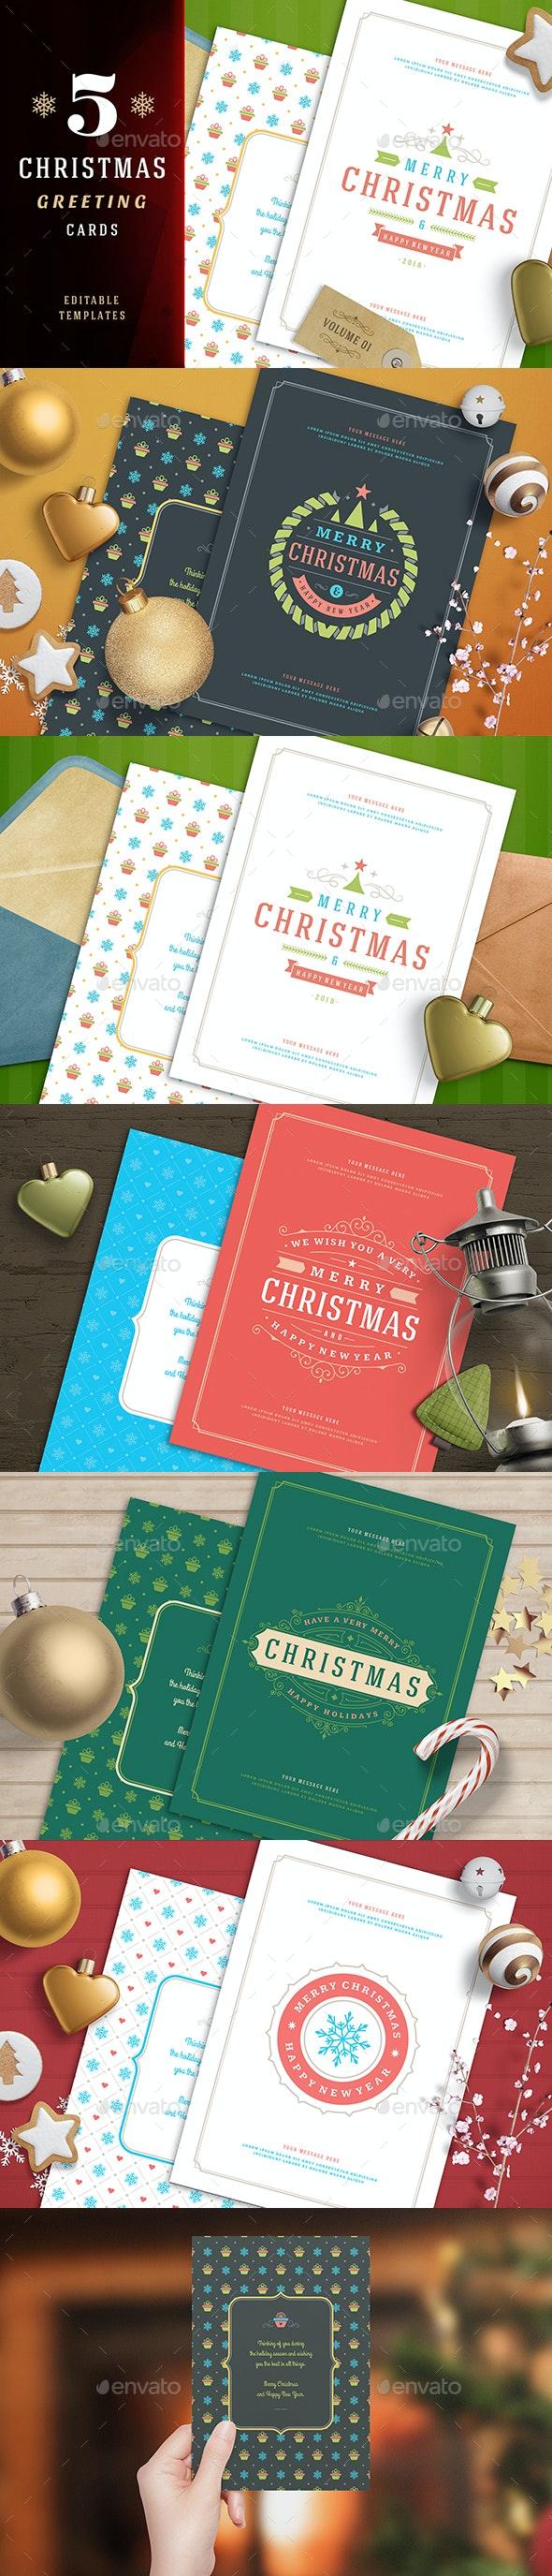 5 Christmas Greeting Cards - Christmas Greeting Cards